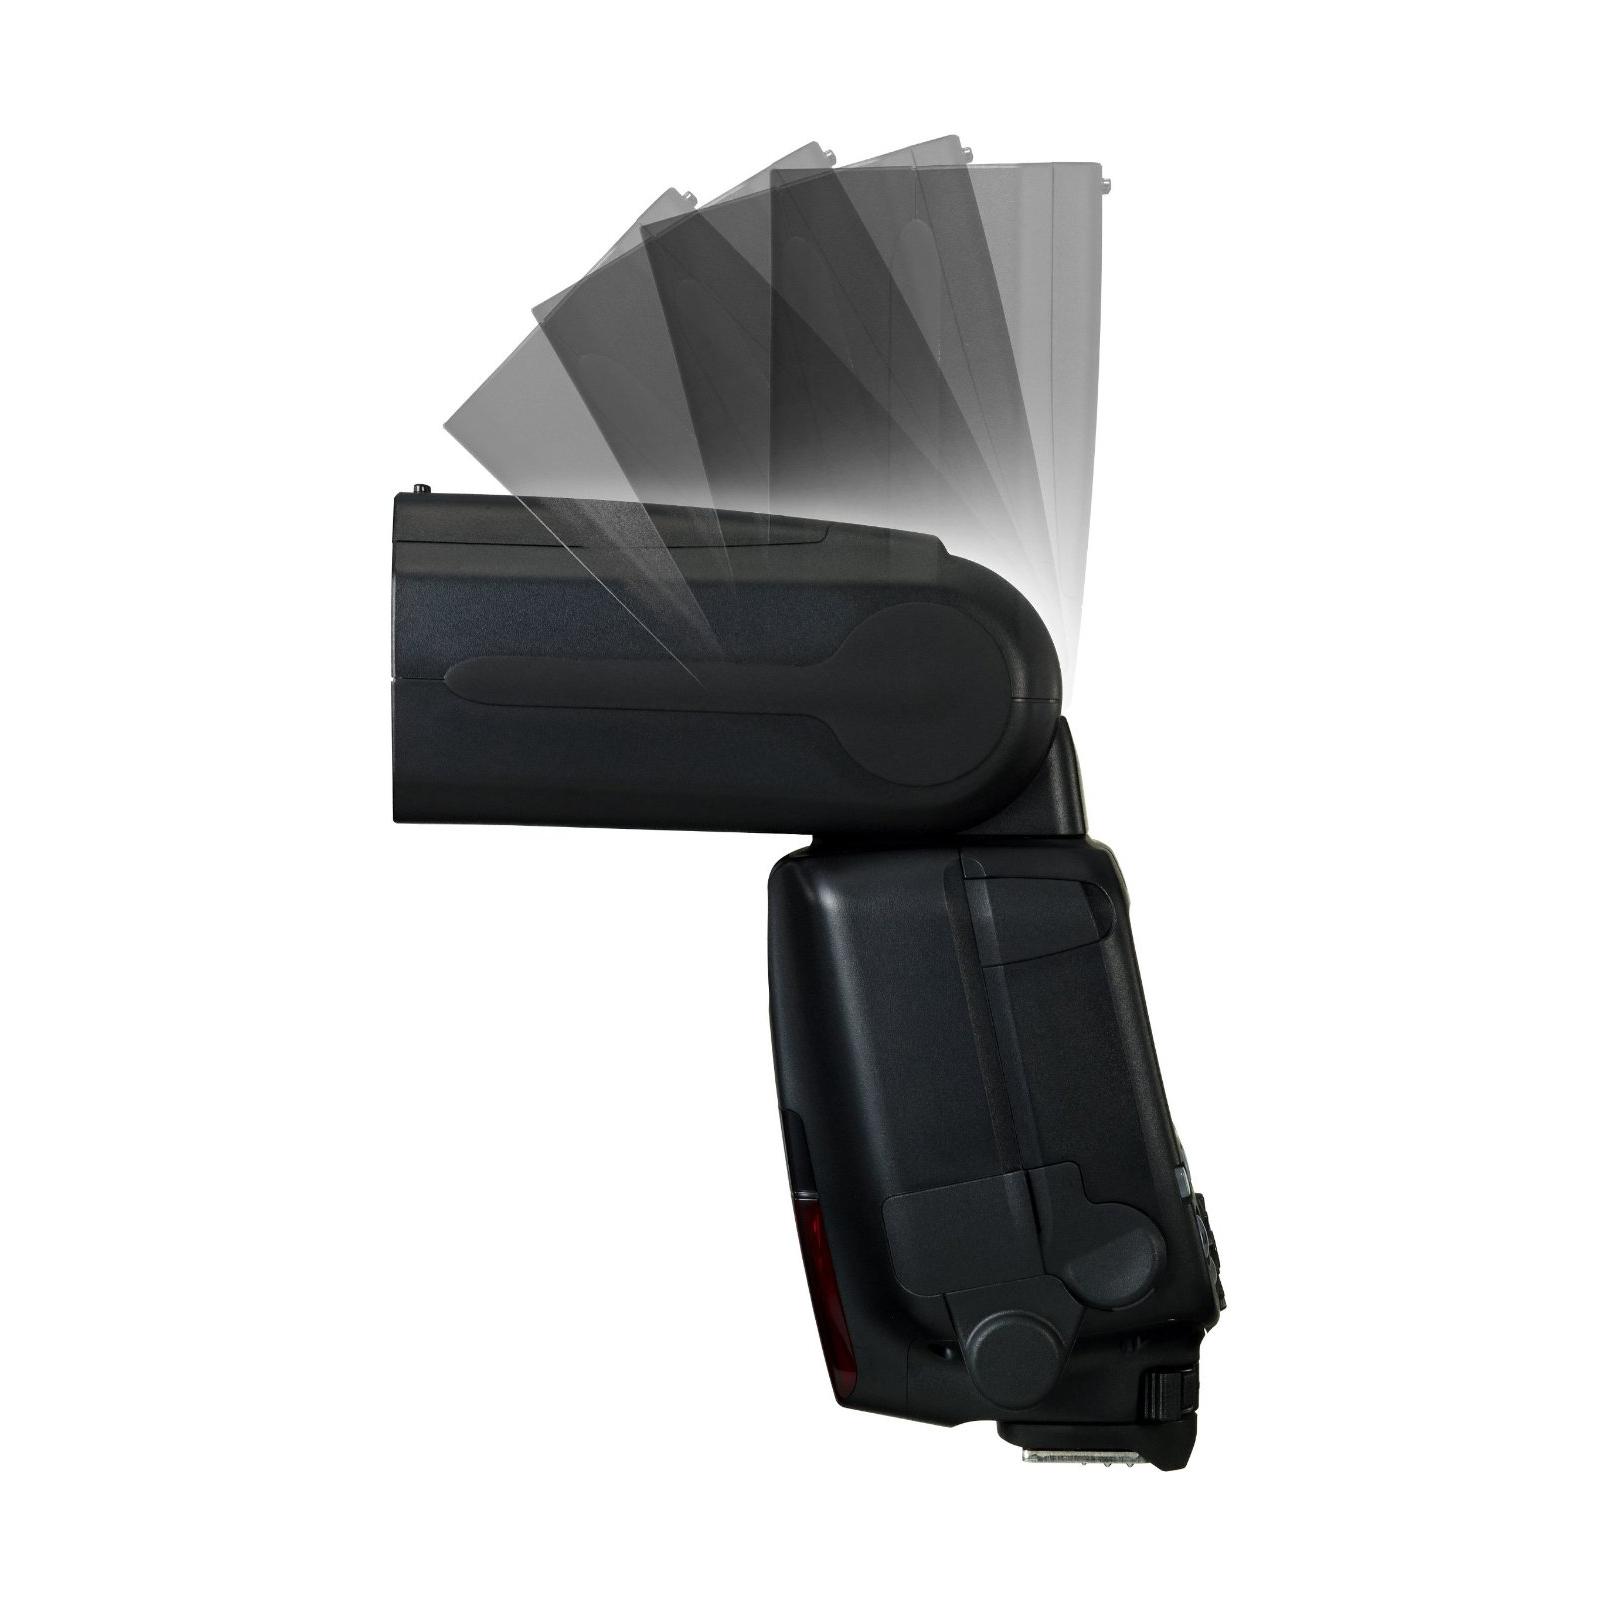 Вспышка Canon Speedlite 600EX (5739B003) изображение 7